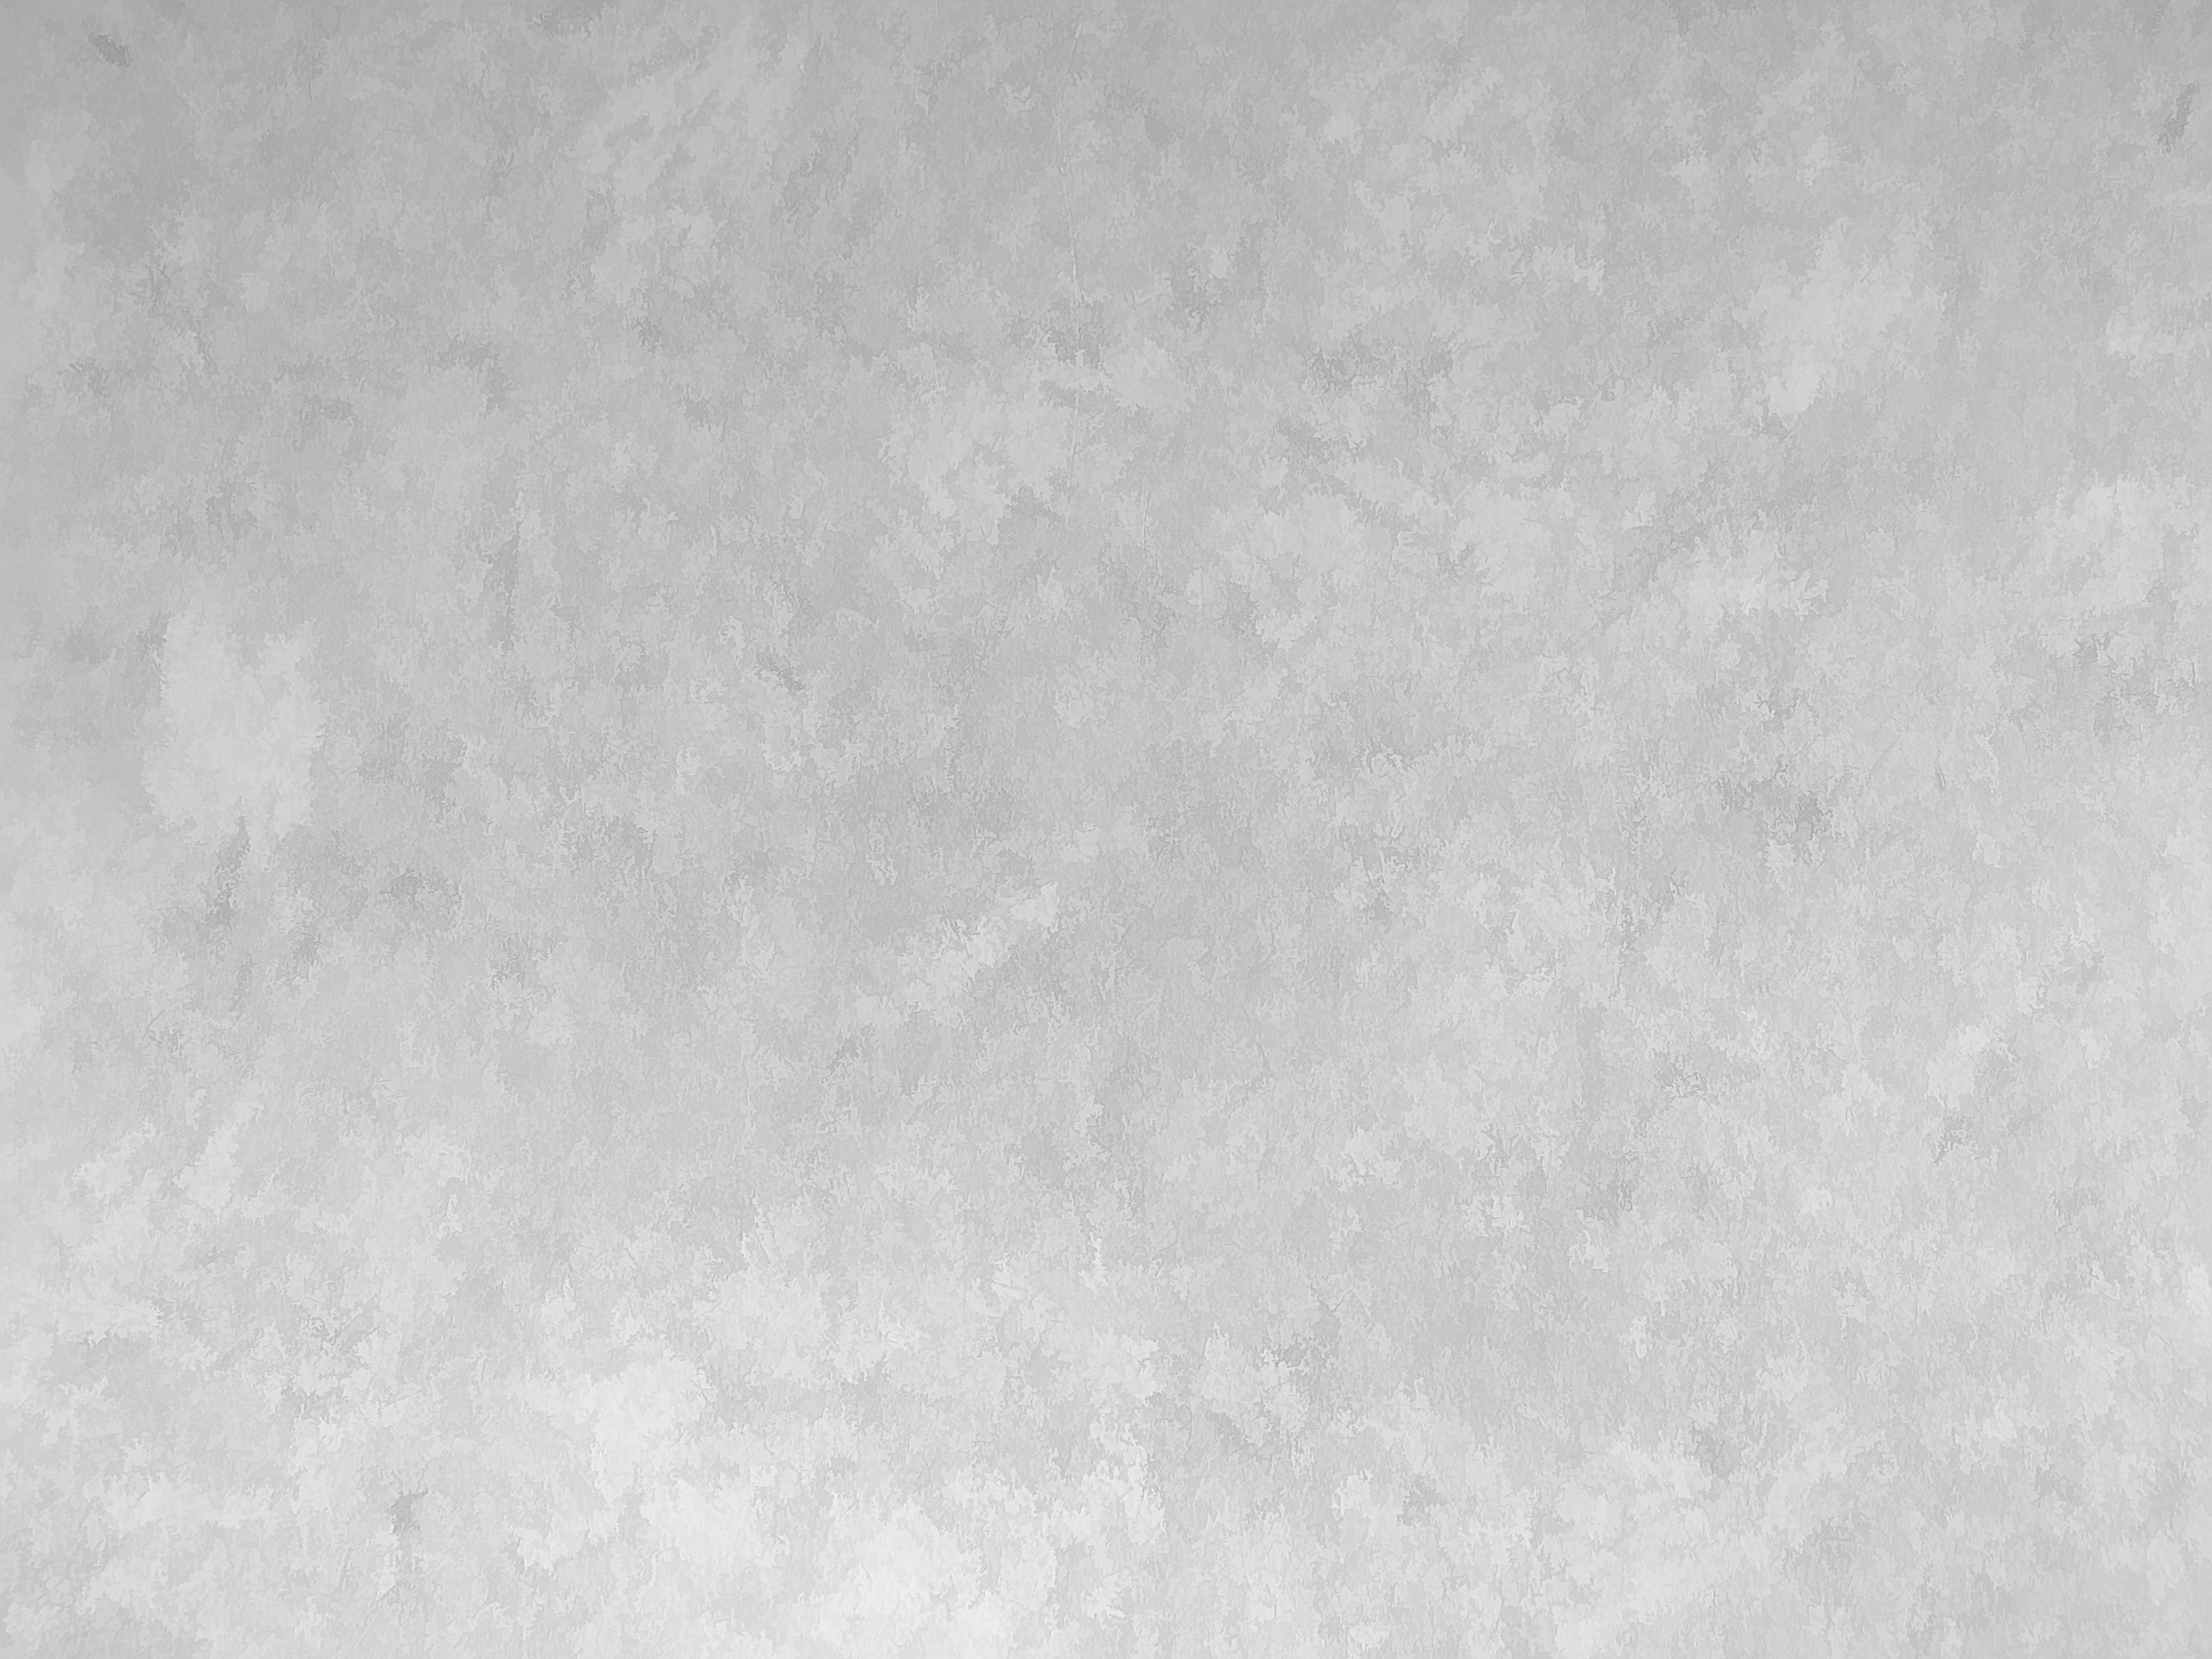 Textured white wallpaper SF Wallpaper